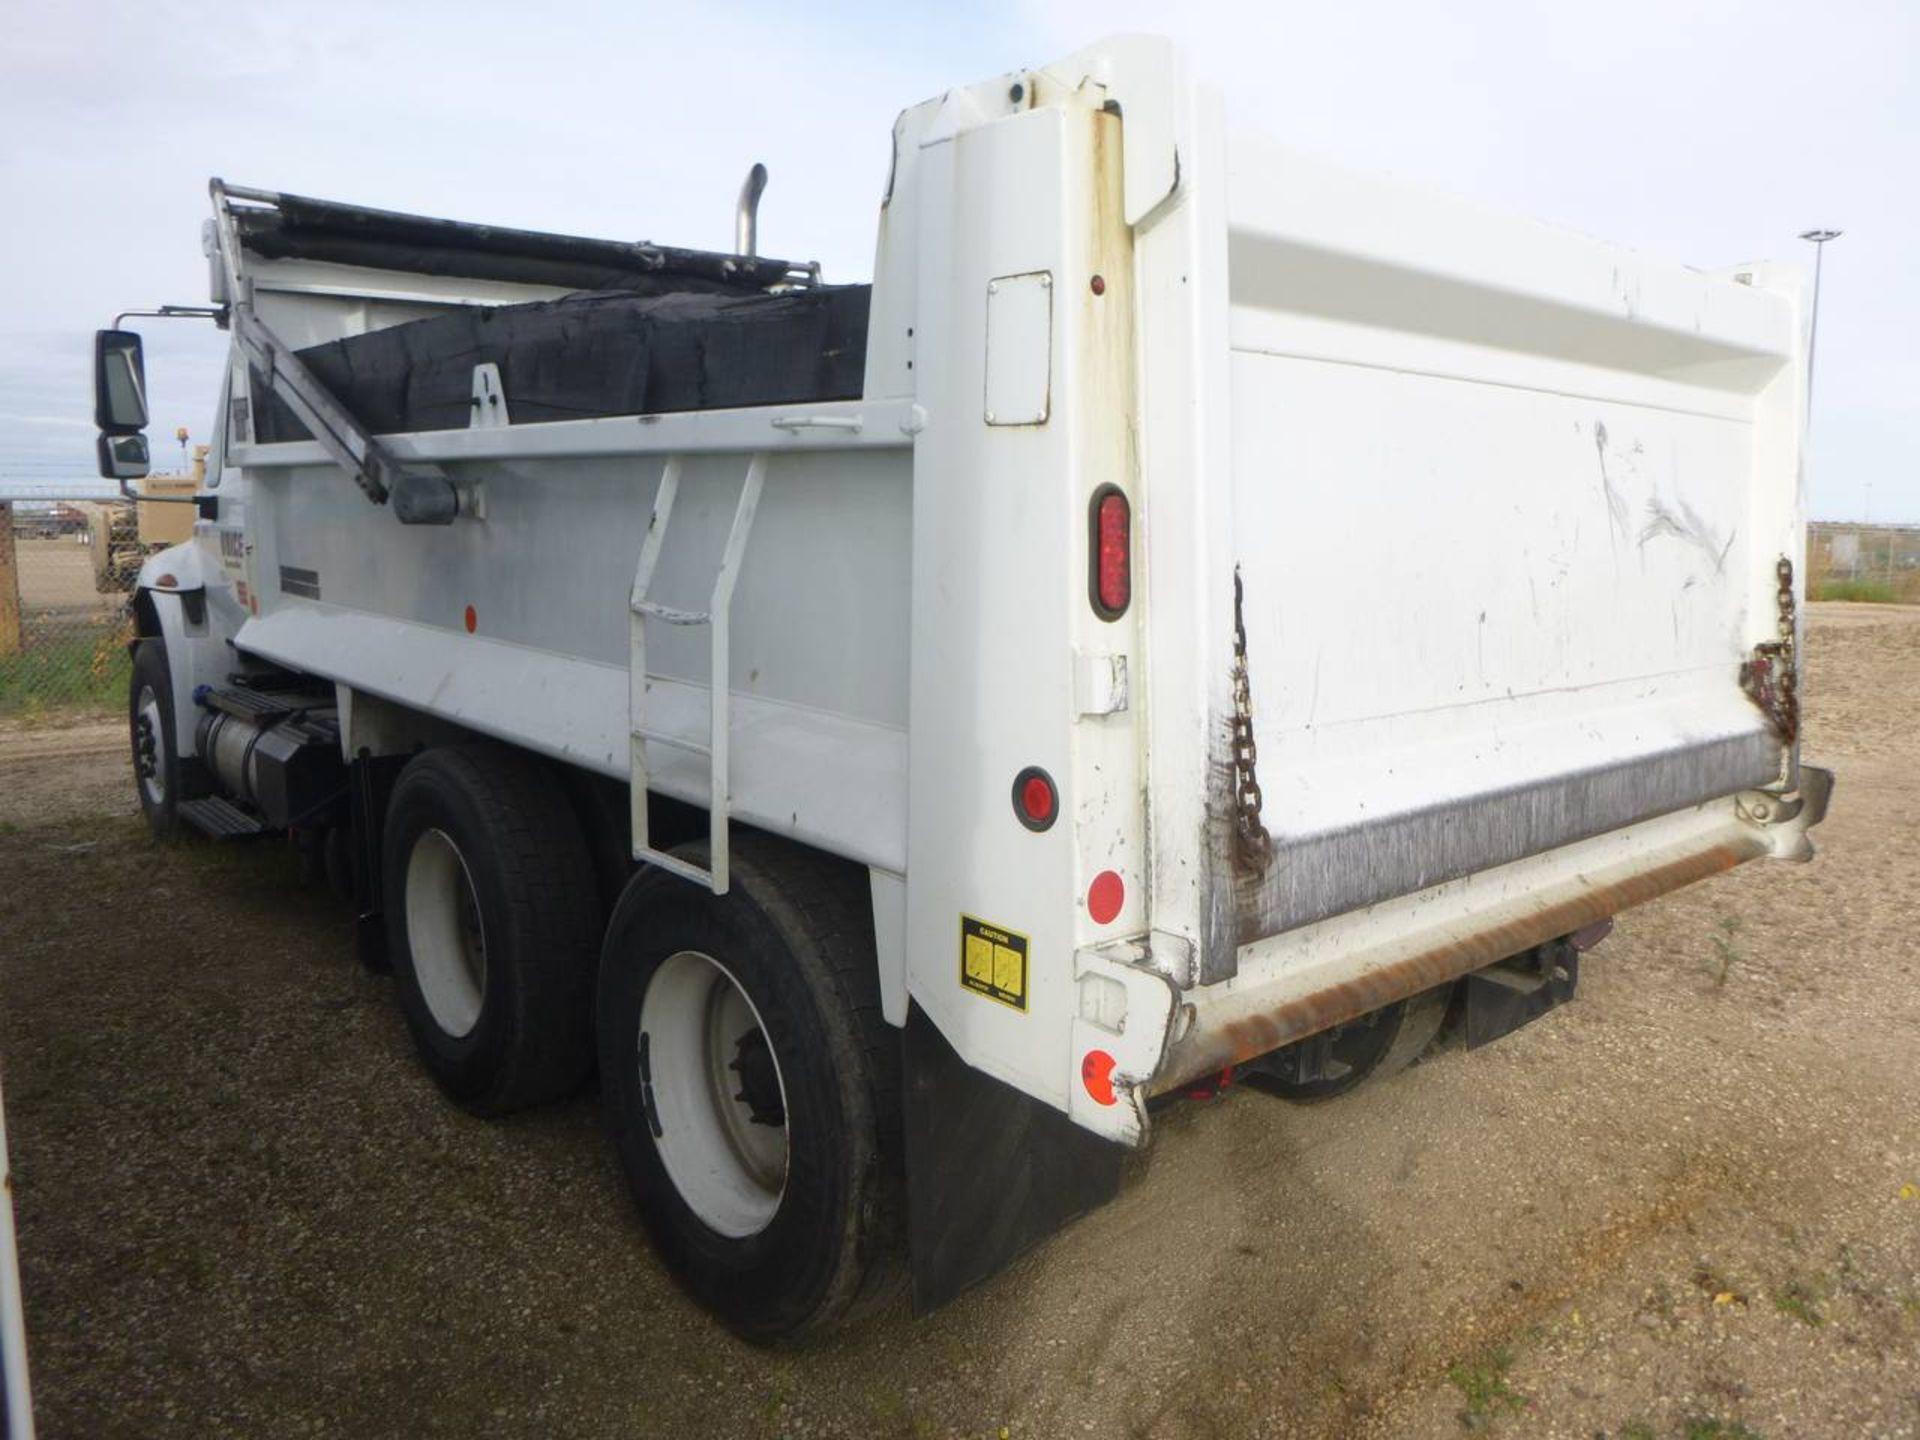 2018 International 4400 SBA 6X4 Dump Truck - Image 4 of 15